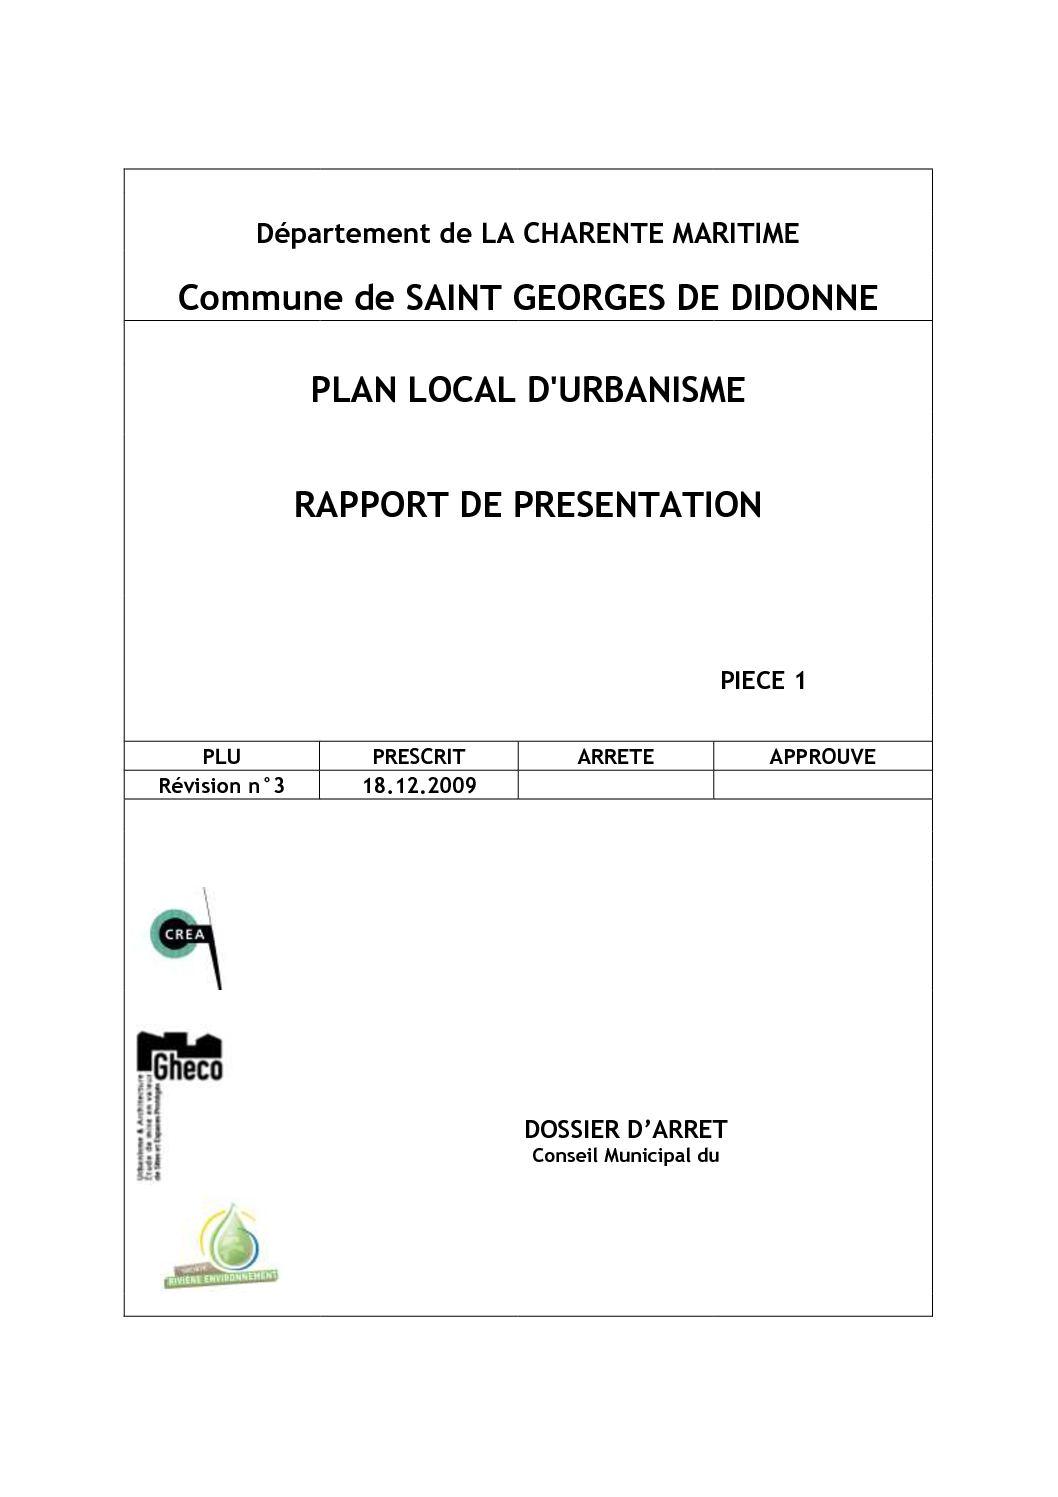 Anima Conseil Saint Georges De Didonne calaméo - 001 sgdd rapport presentation arret